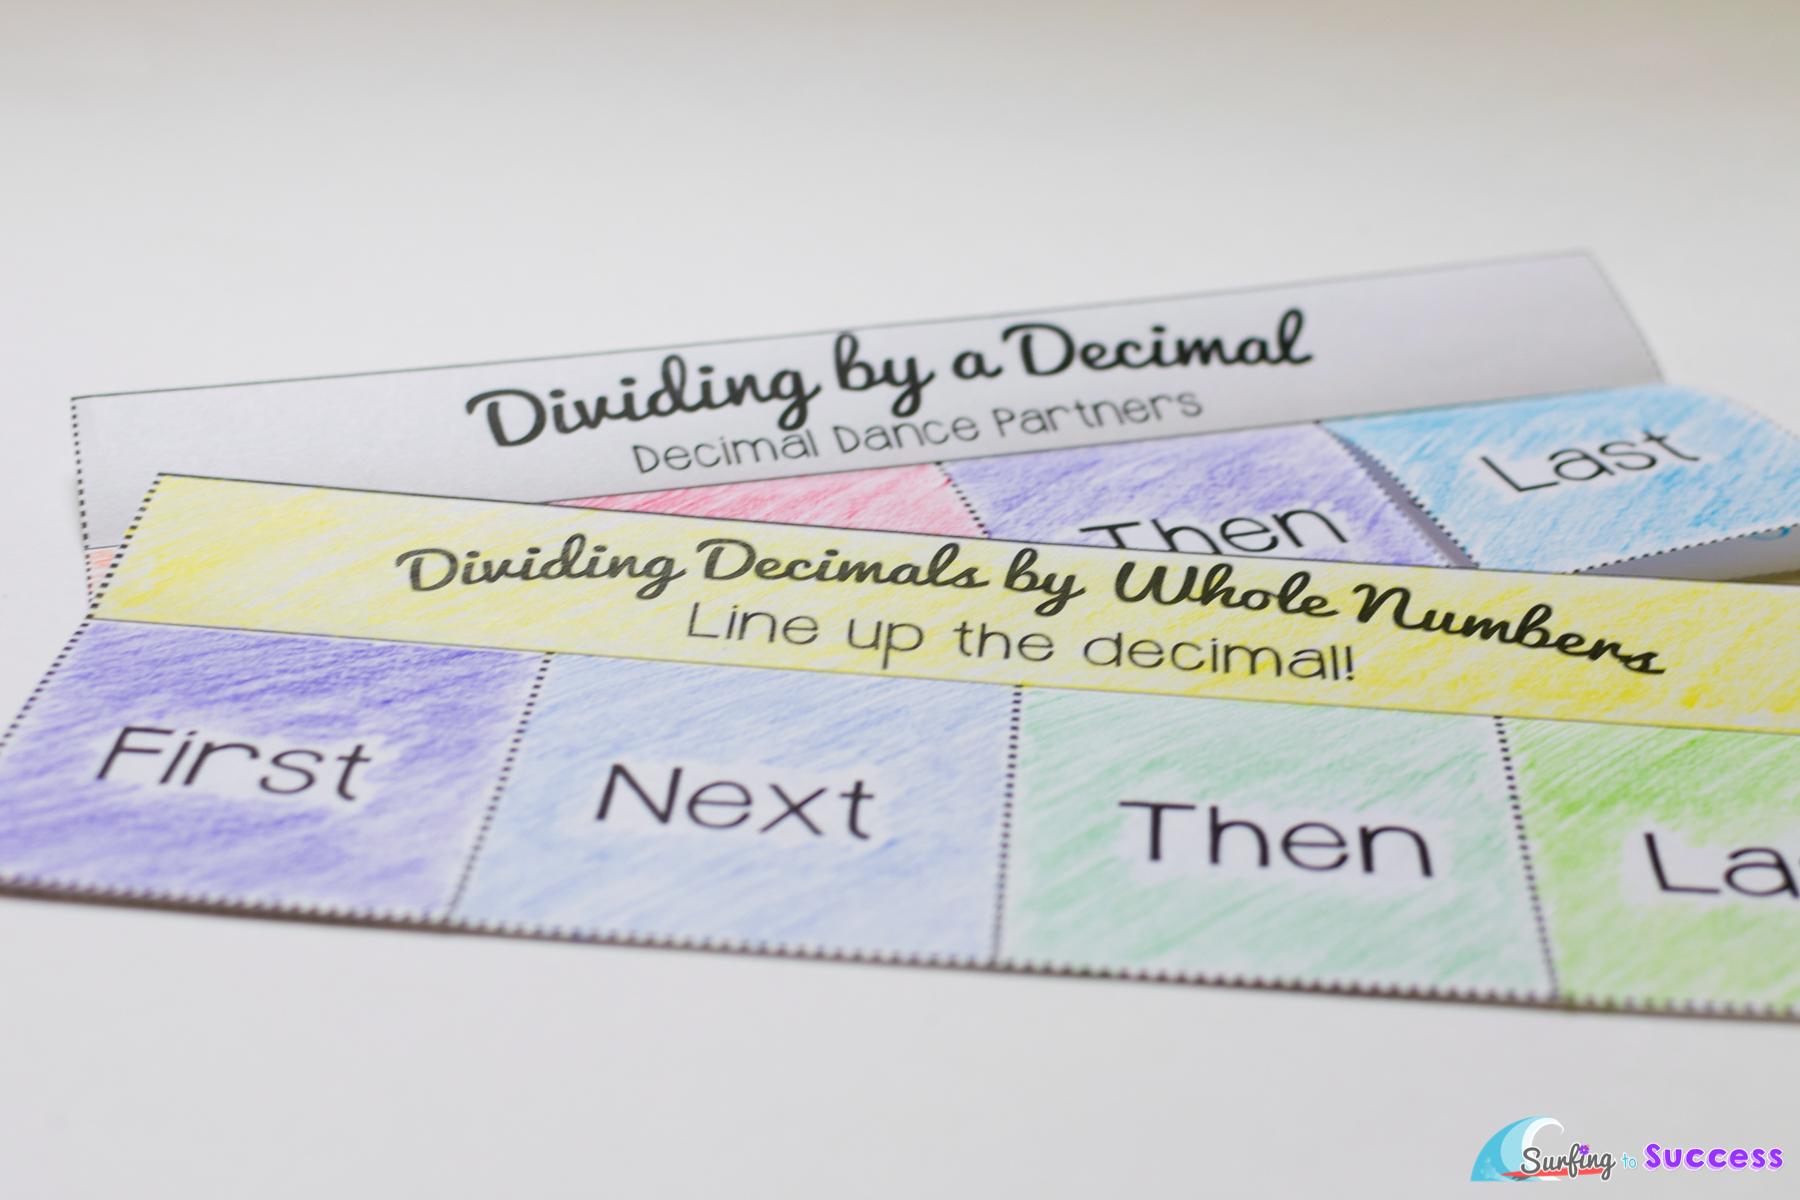 Free Dividing Decimals Worksheets - Surfing to Success [ 1200 x 1800 Pixel ]